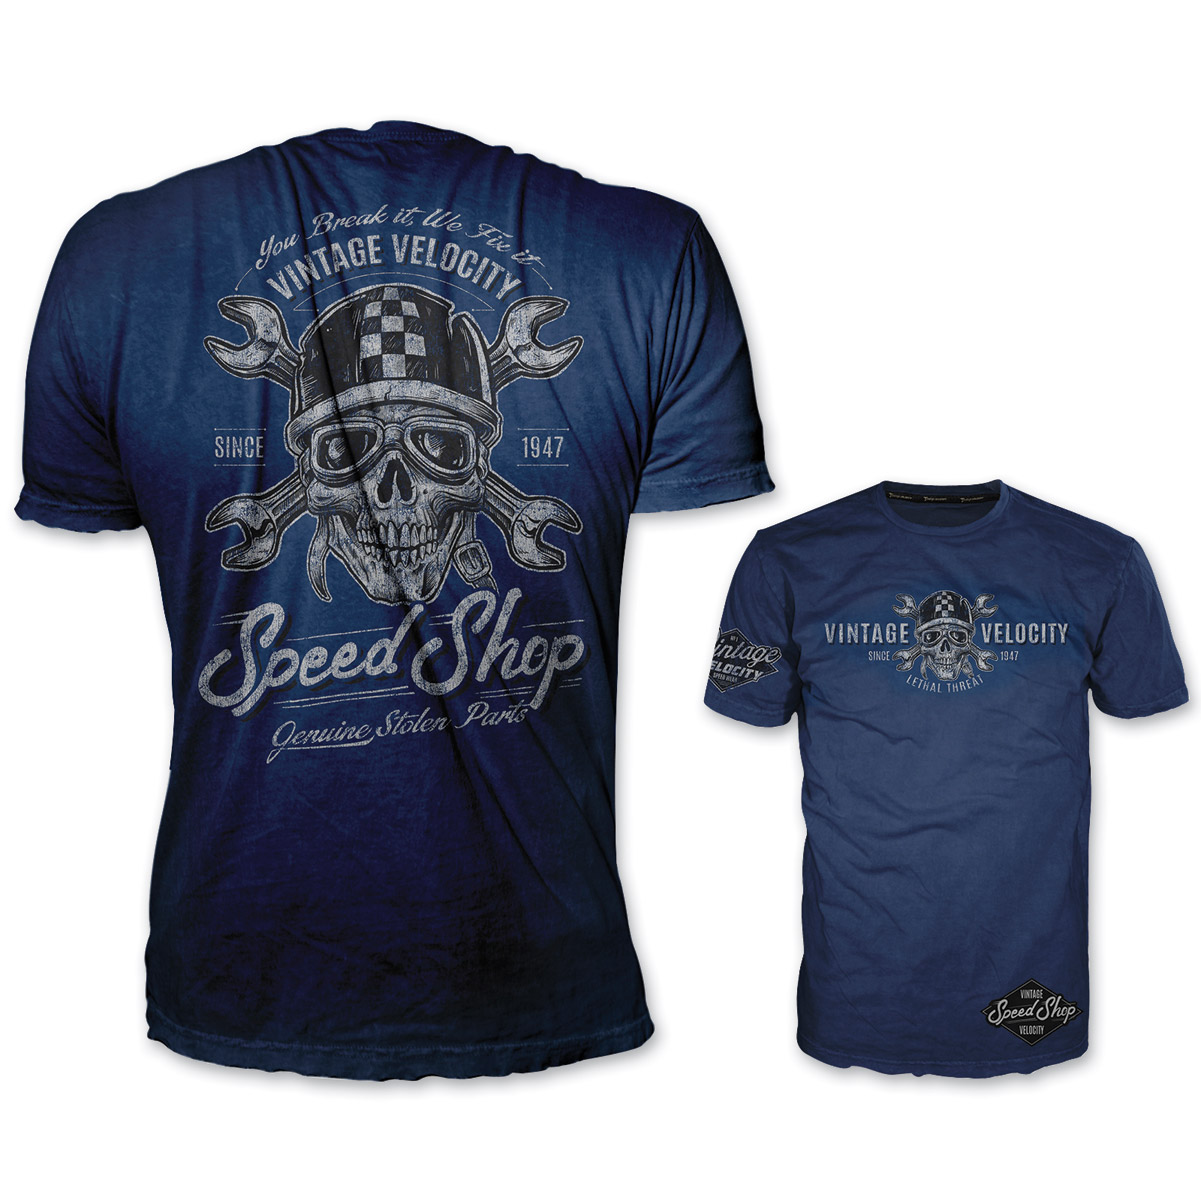 Lethal Threat Vintage Velocity Men's Speed Shop Blue T-Shirt